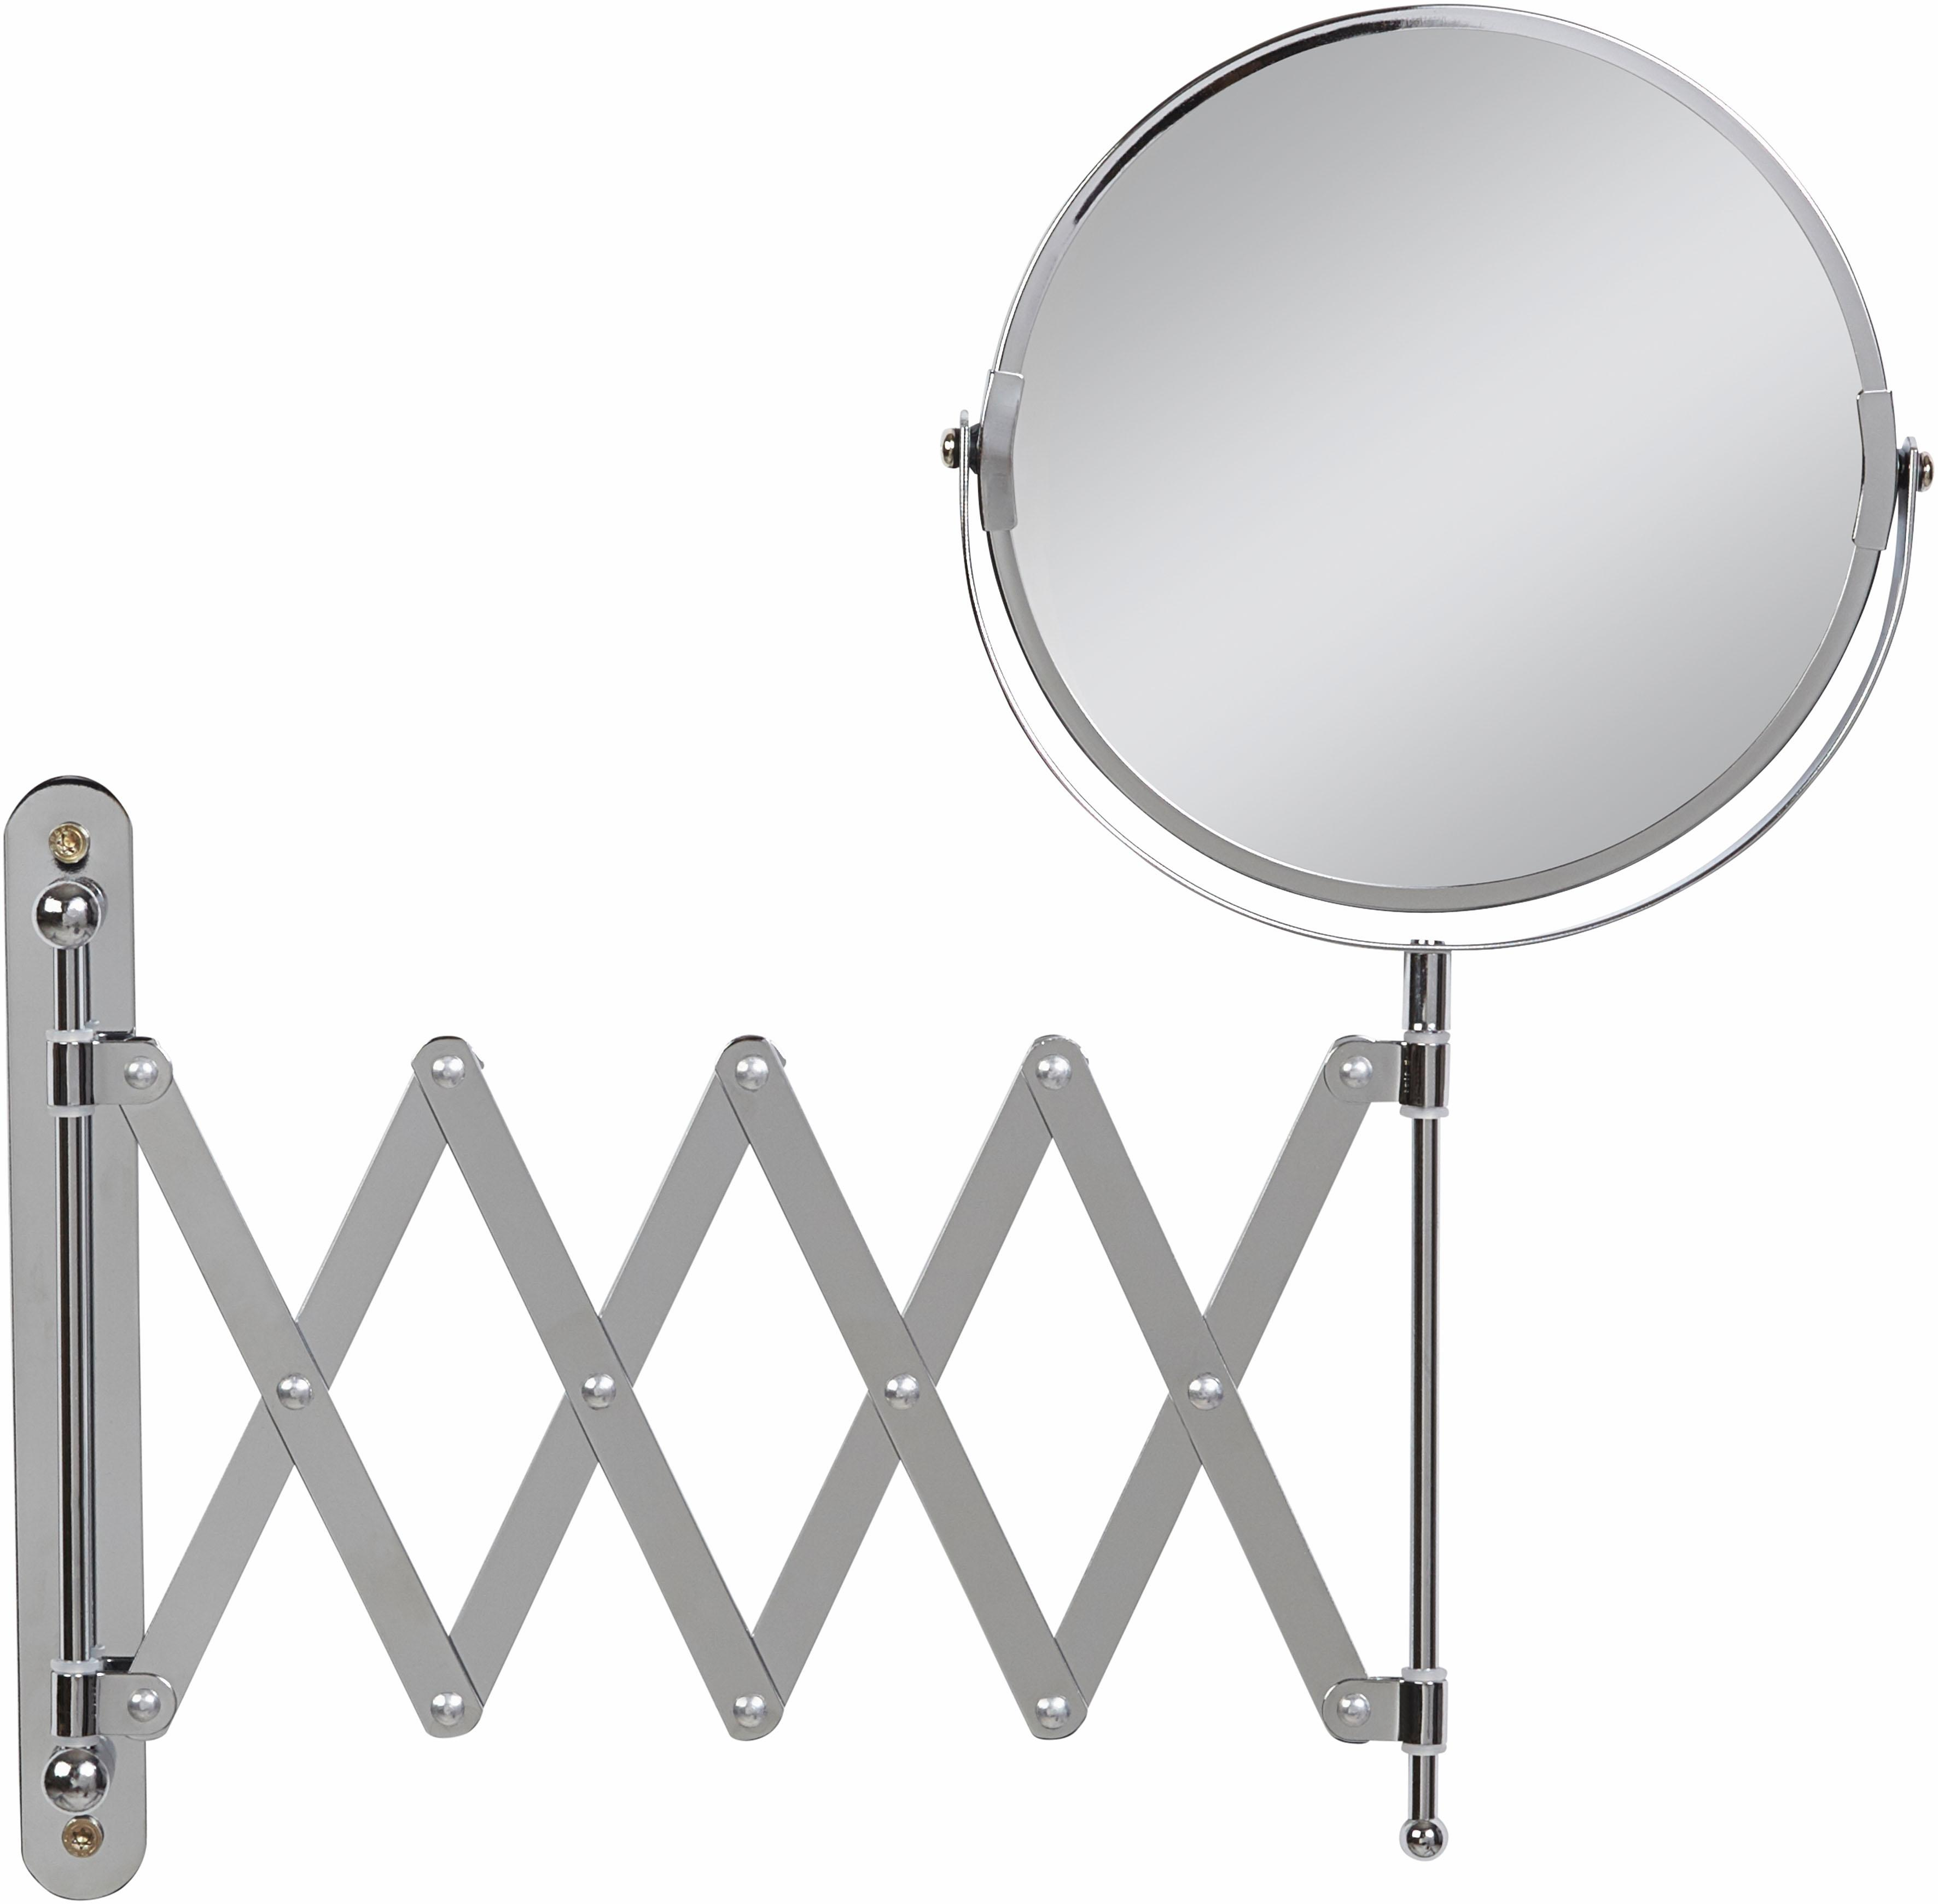 Express Solutions Kosmetikspiegel   Bad > Bad-Accessoires > Kosmetikspiegel   Grau   EXPRESS